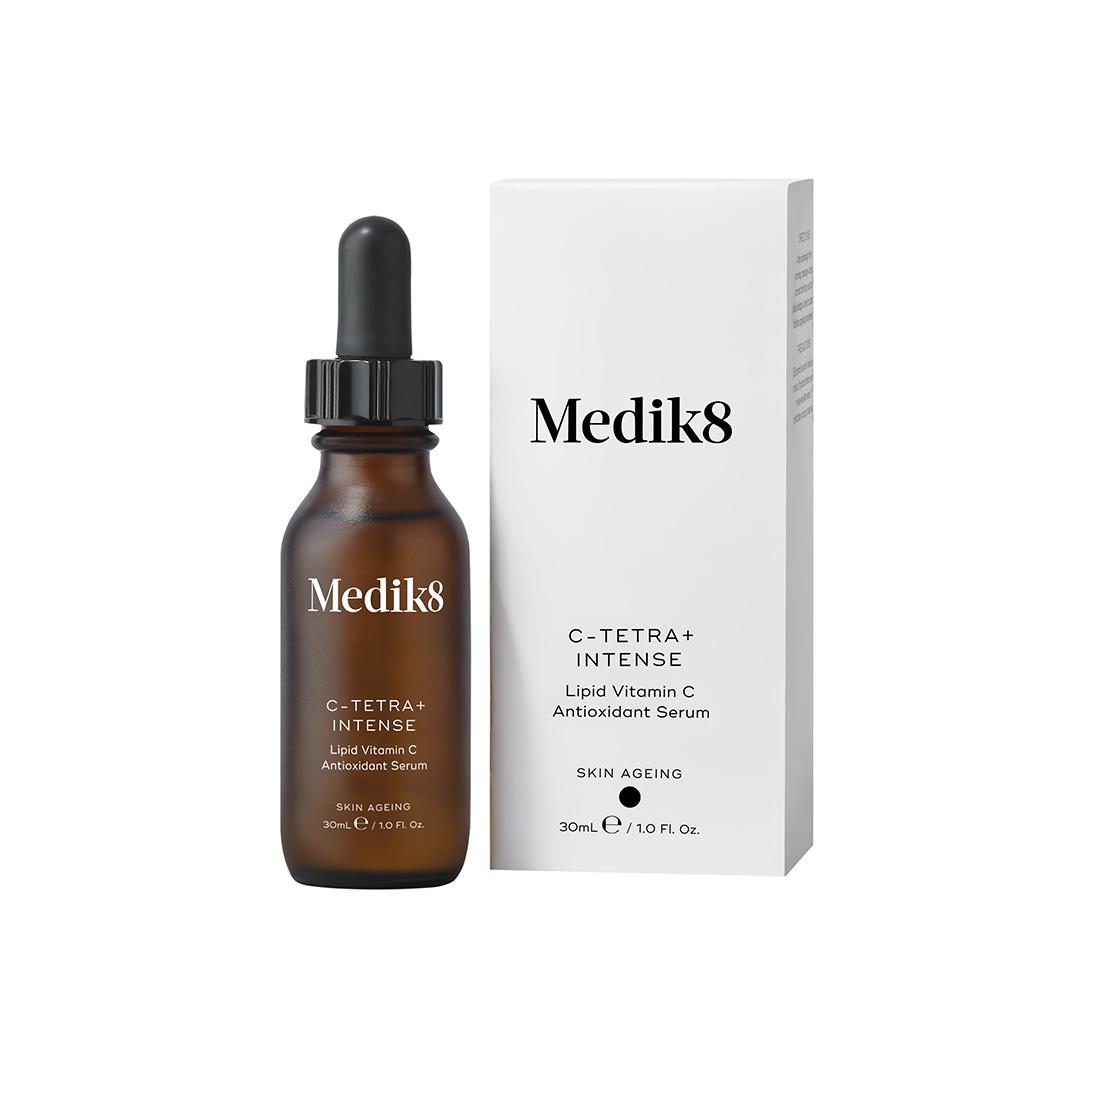 Medik8 C-TETRA + Intense sérum - nejsilnější sérum s vit.C